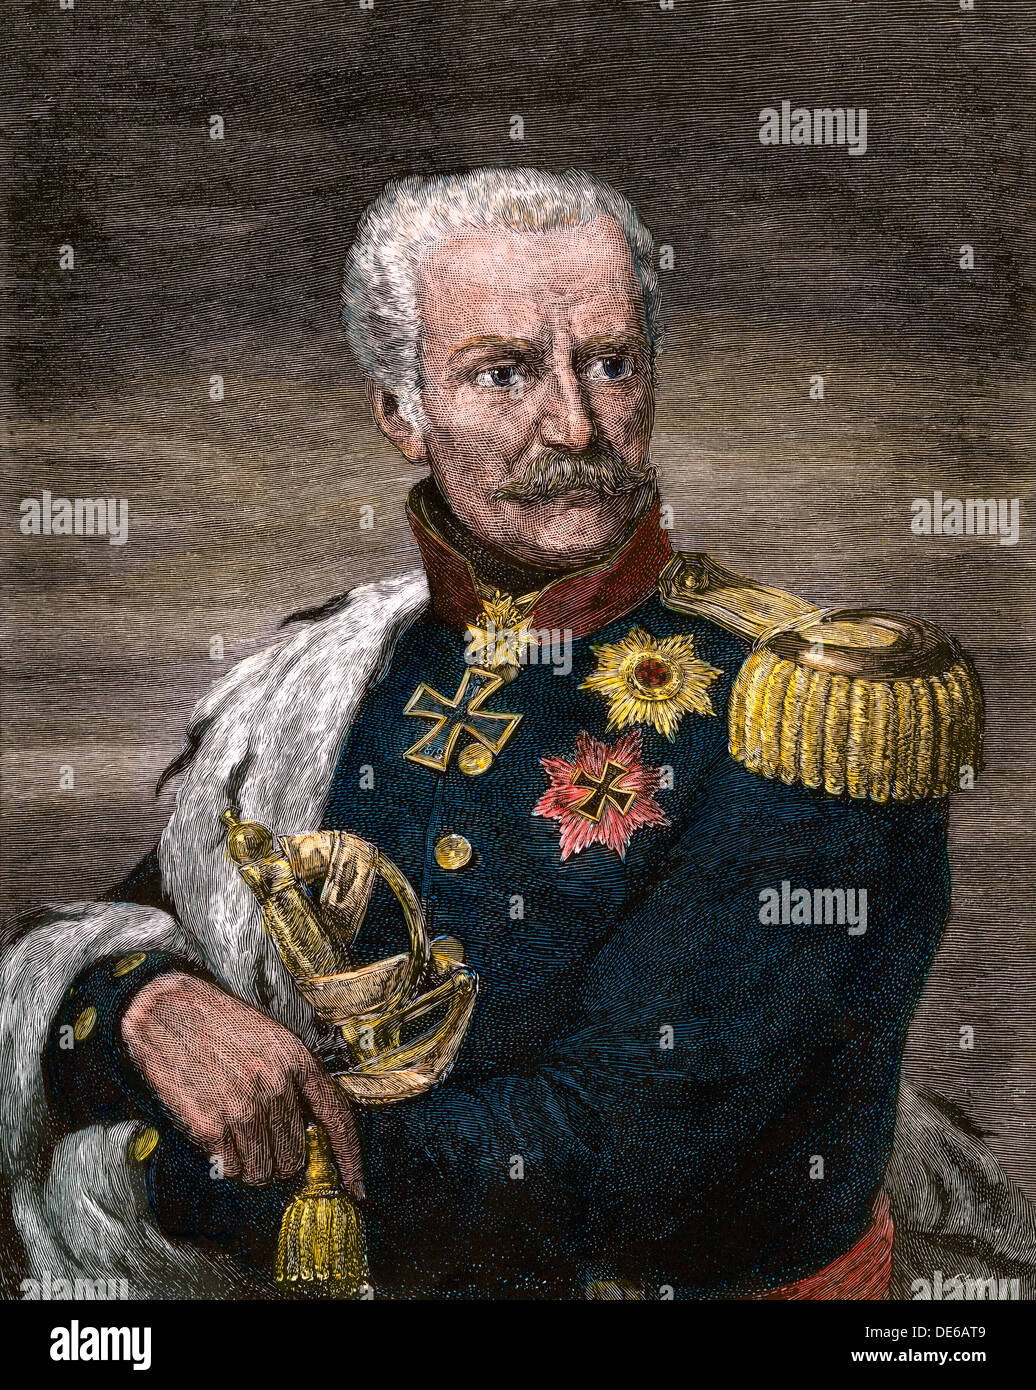 Field Marshal Gebhard Leberecht von Blucher, Prussian commander at Waterloo. Hand-colored woodcut - Stock Image